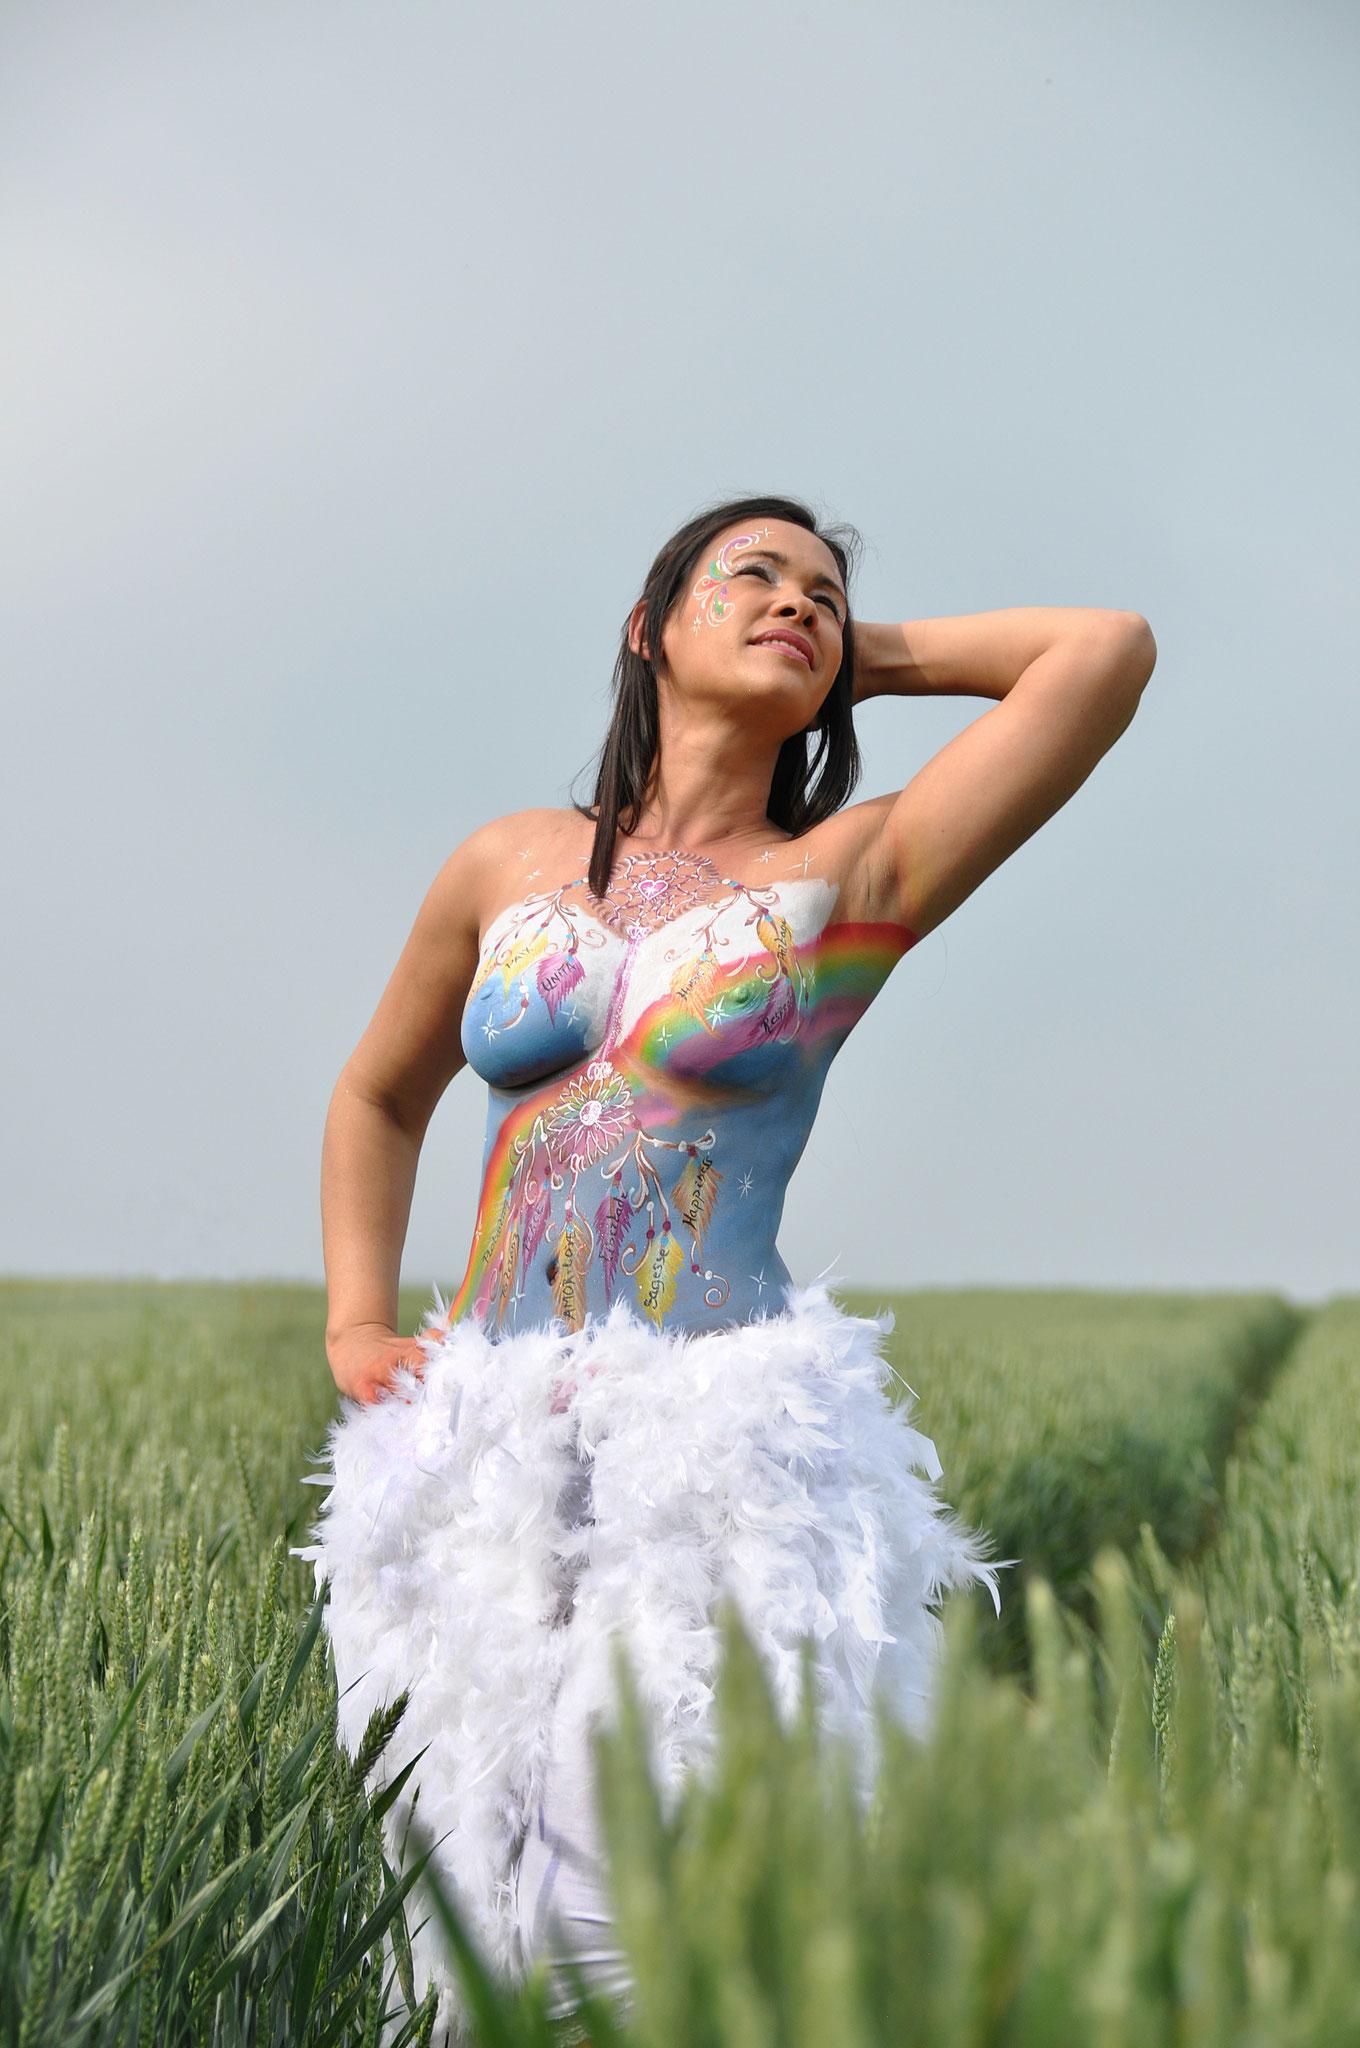 body painting, Femme sacrée